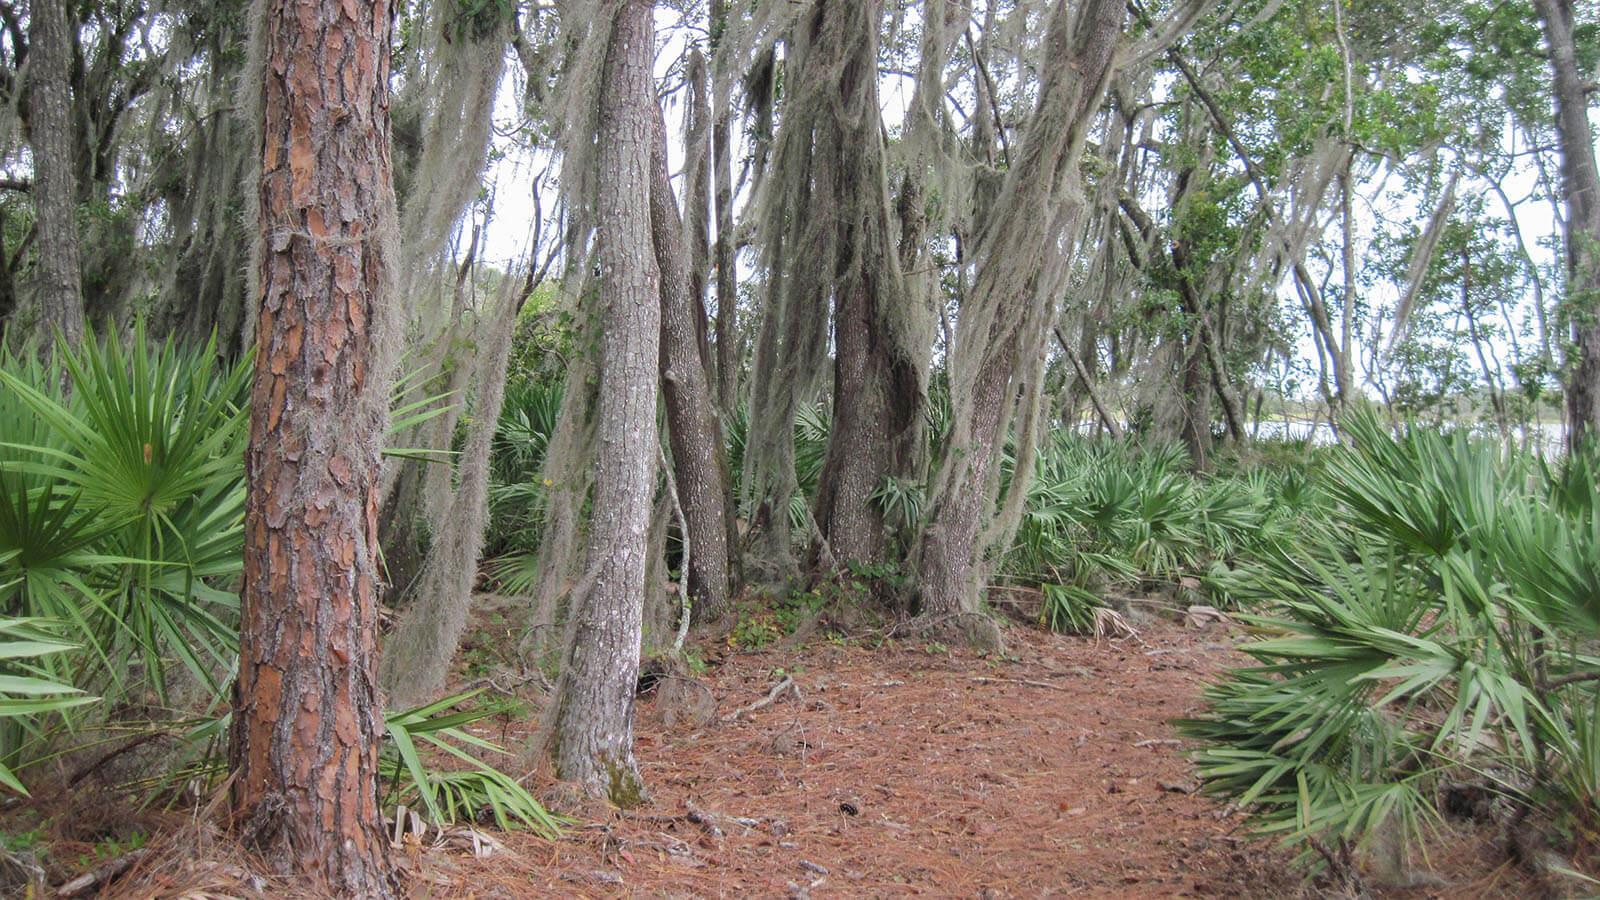 Trail through pines to South Lake